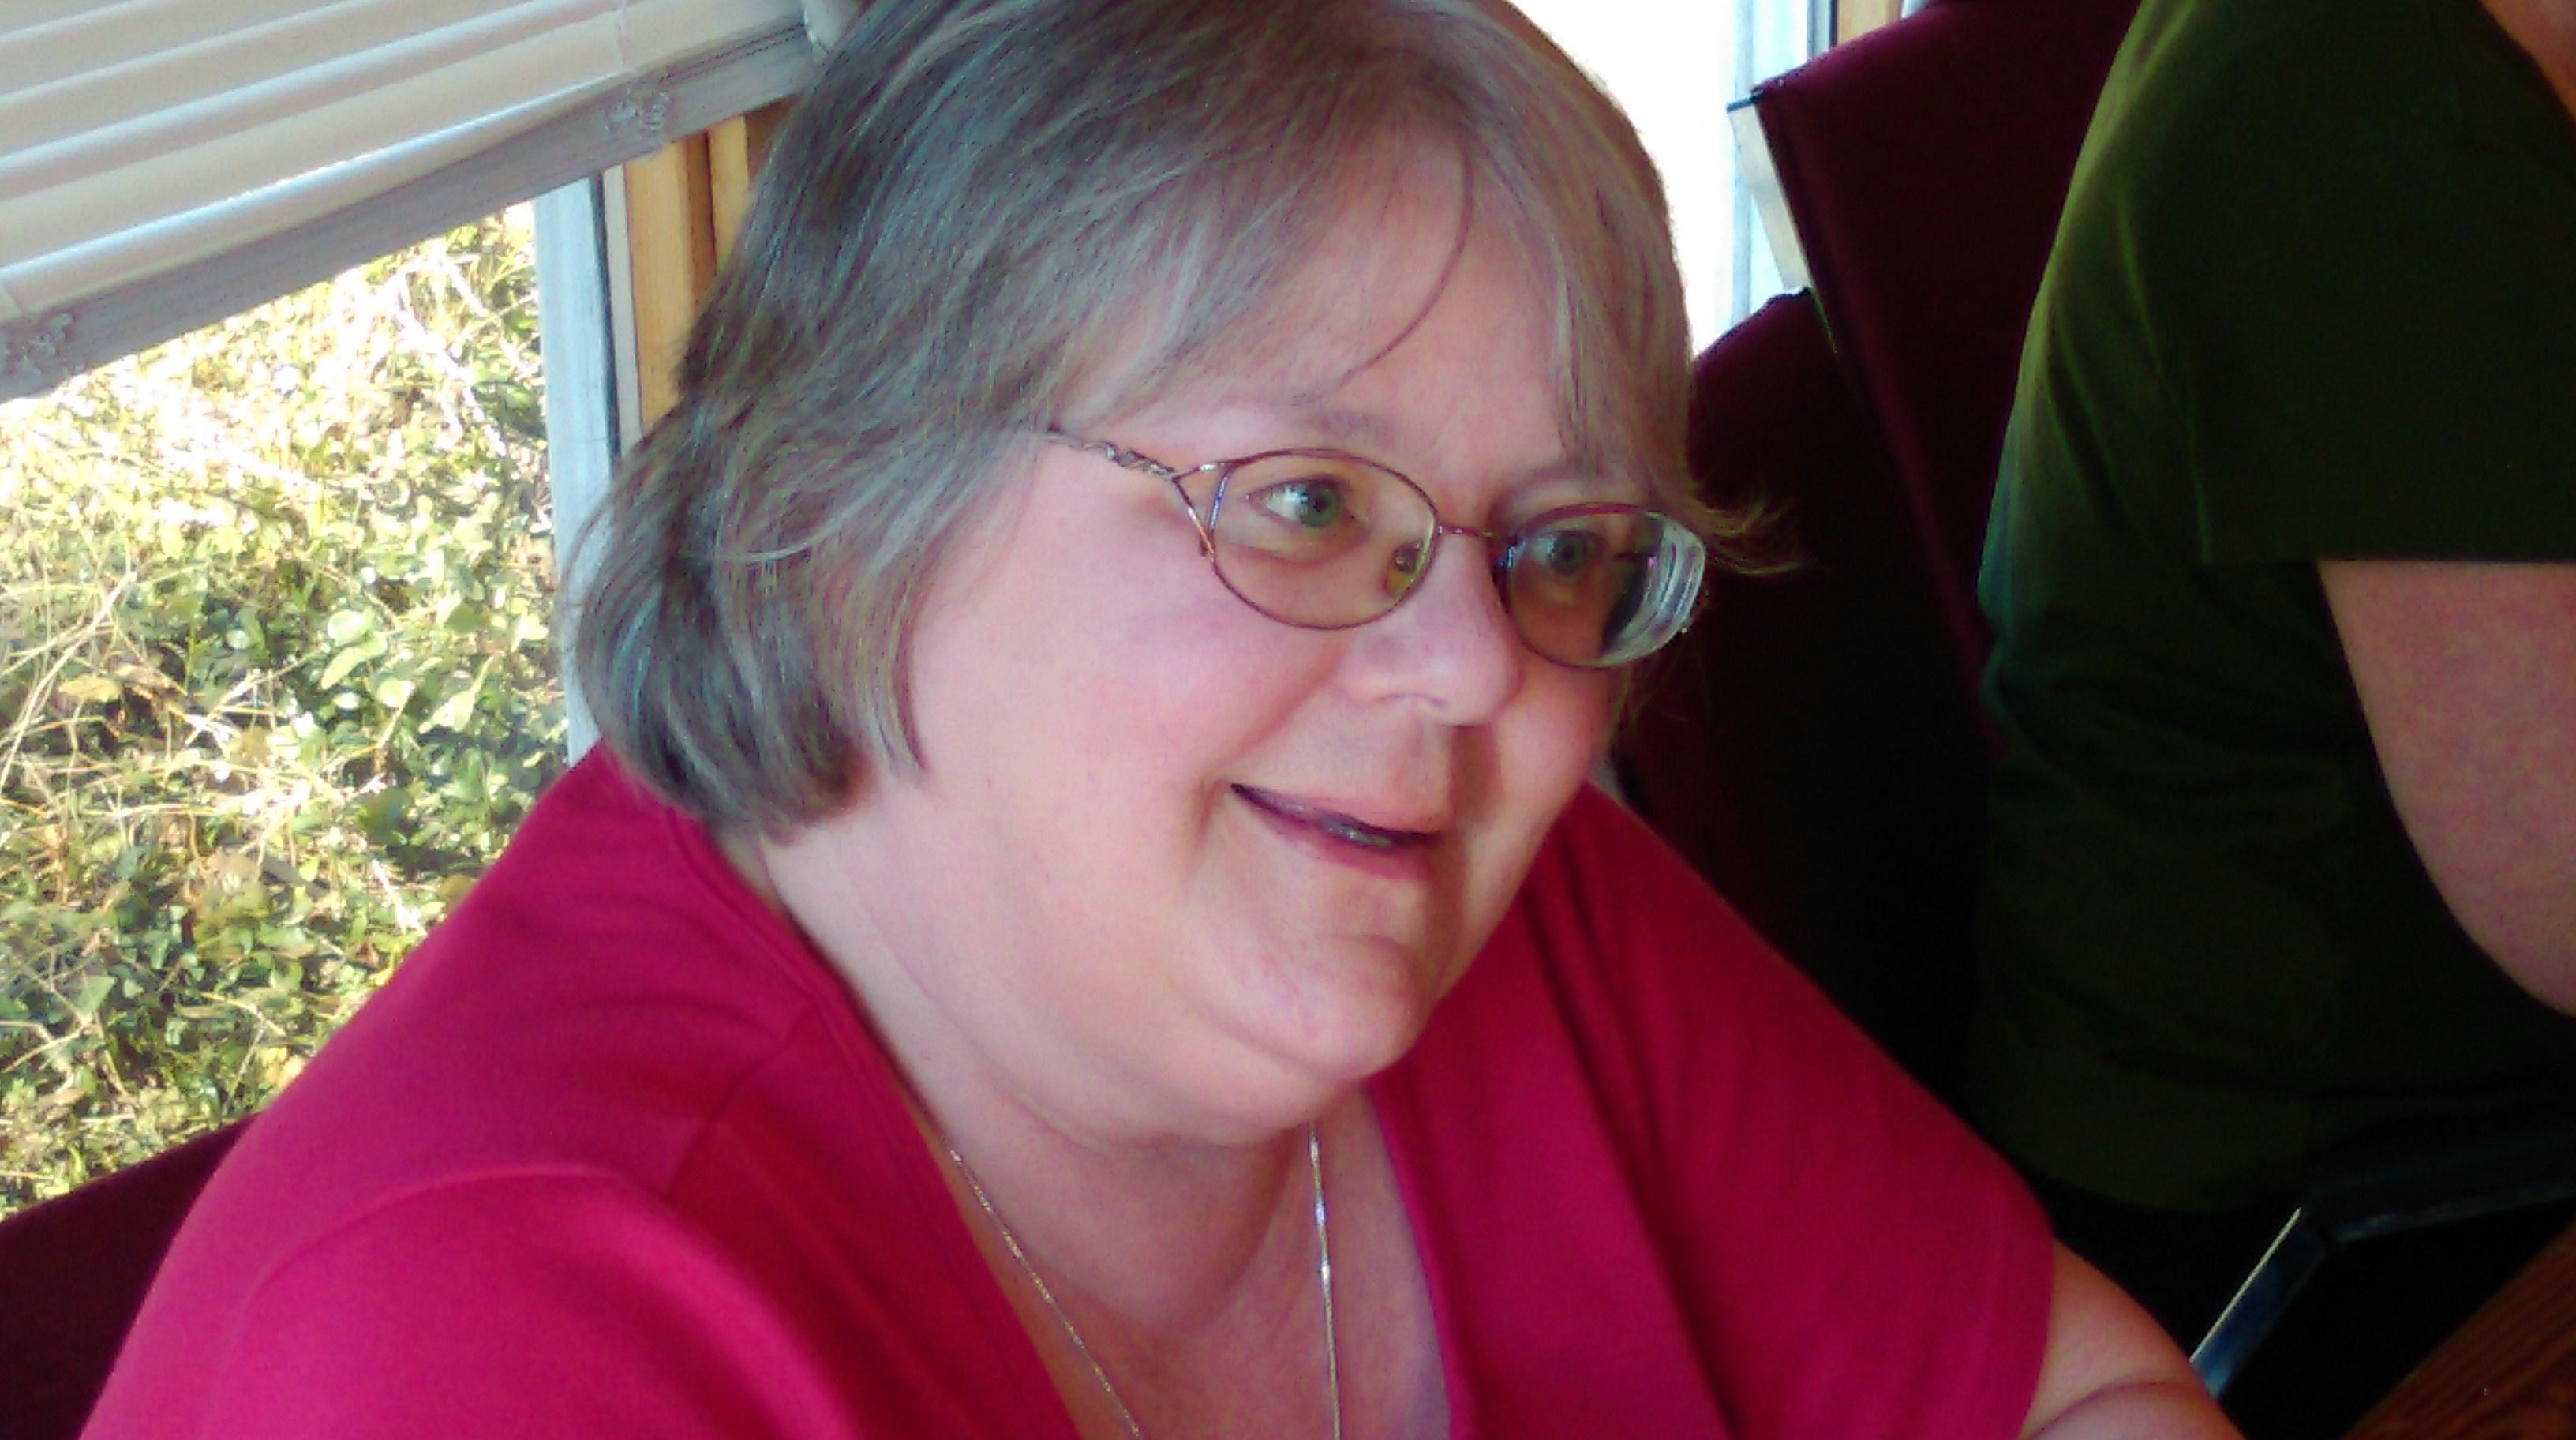 Krista Jameson